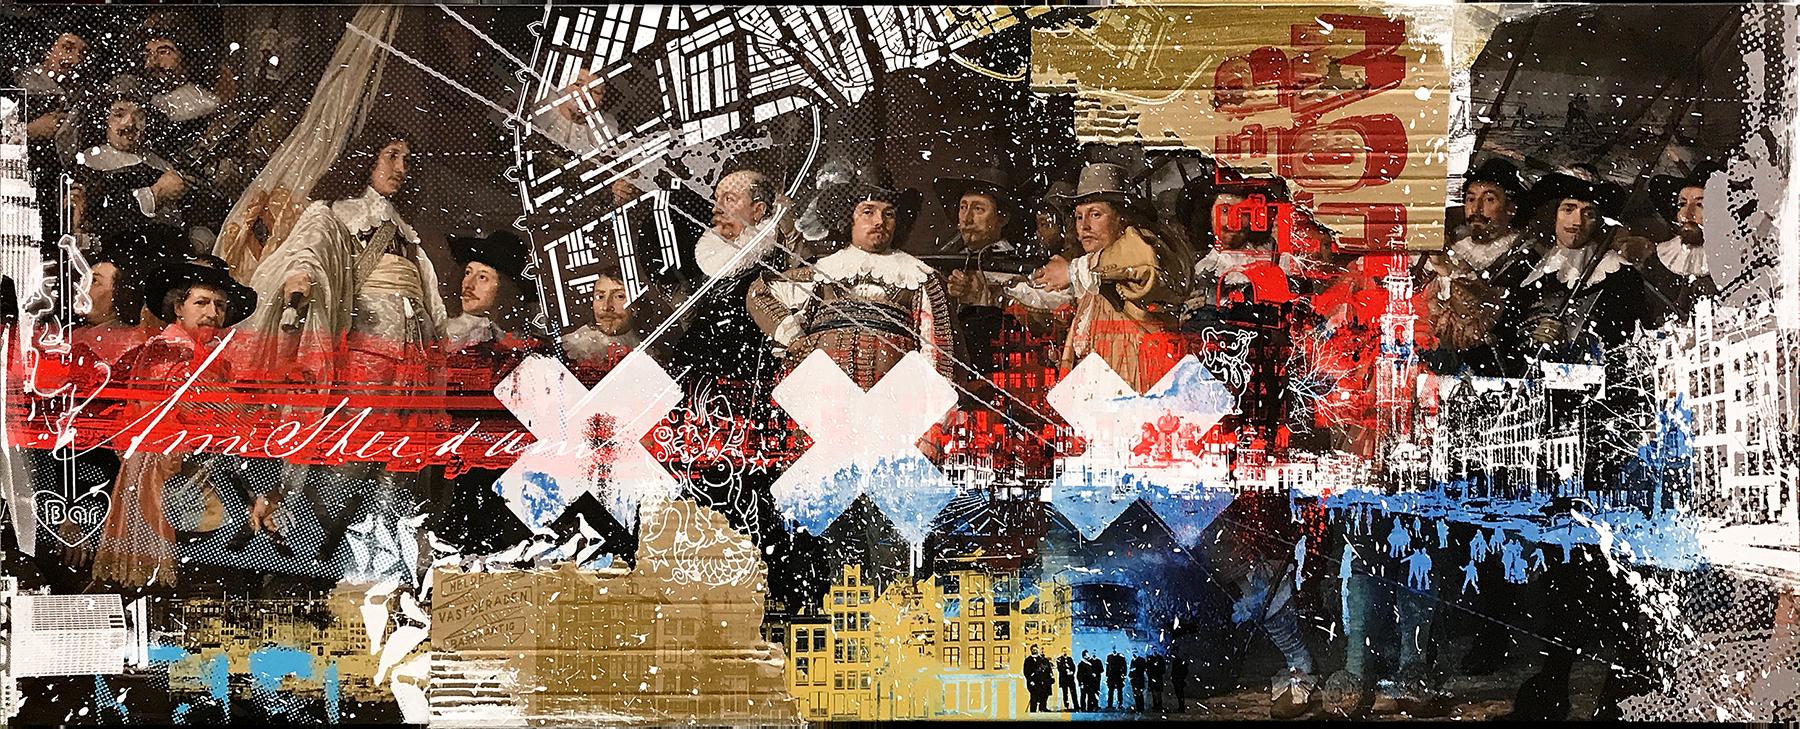 AMSTERDAM! (160 x 64cm)